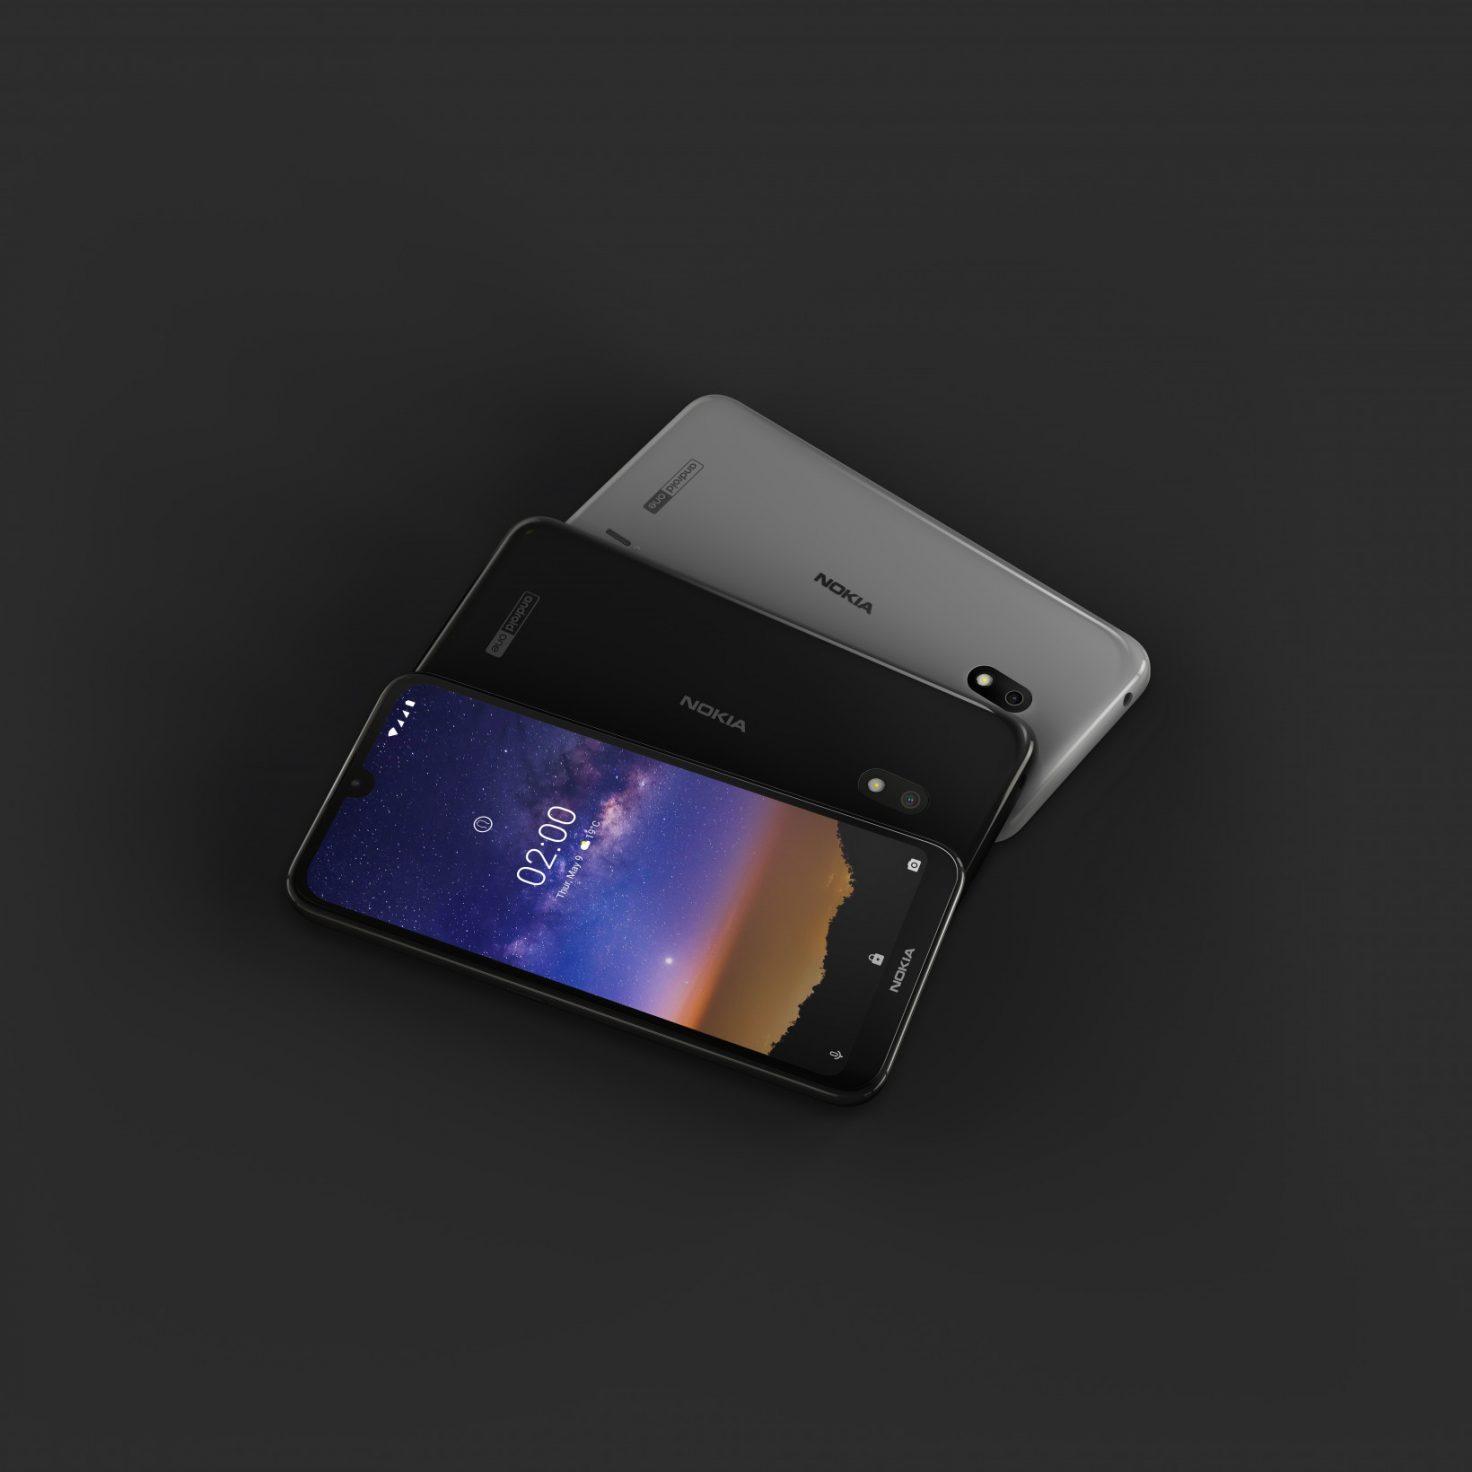 Nokia-2.2_Unlock-1472x1472